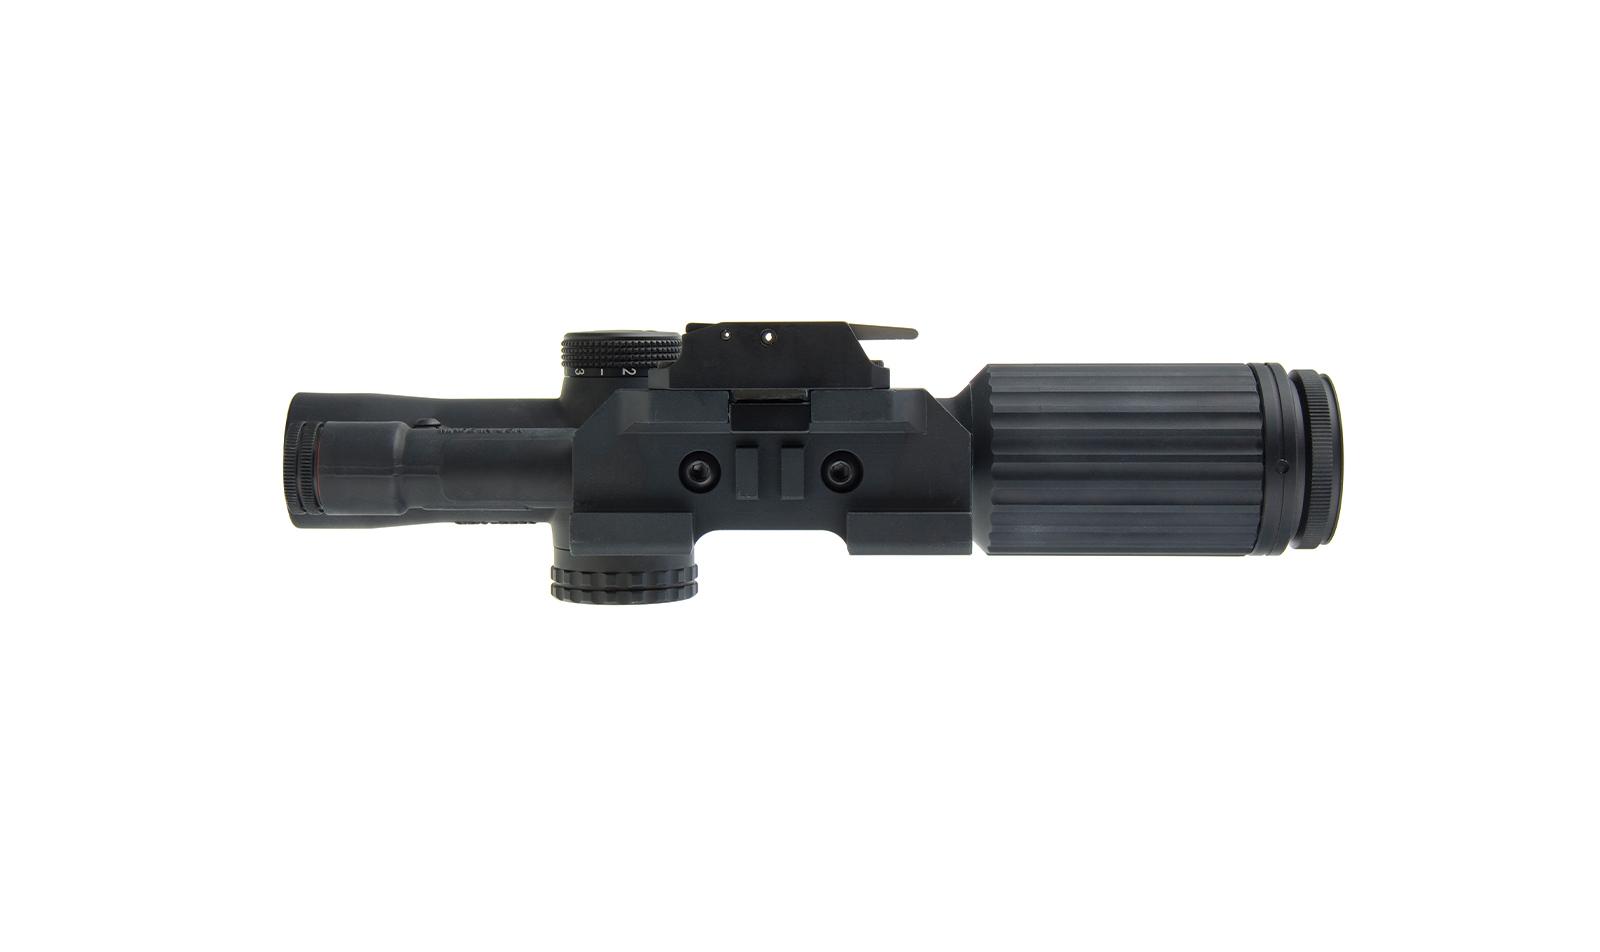 VC16-C-1600010 angle 10